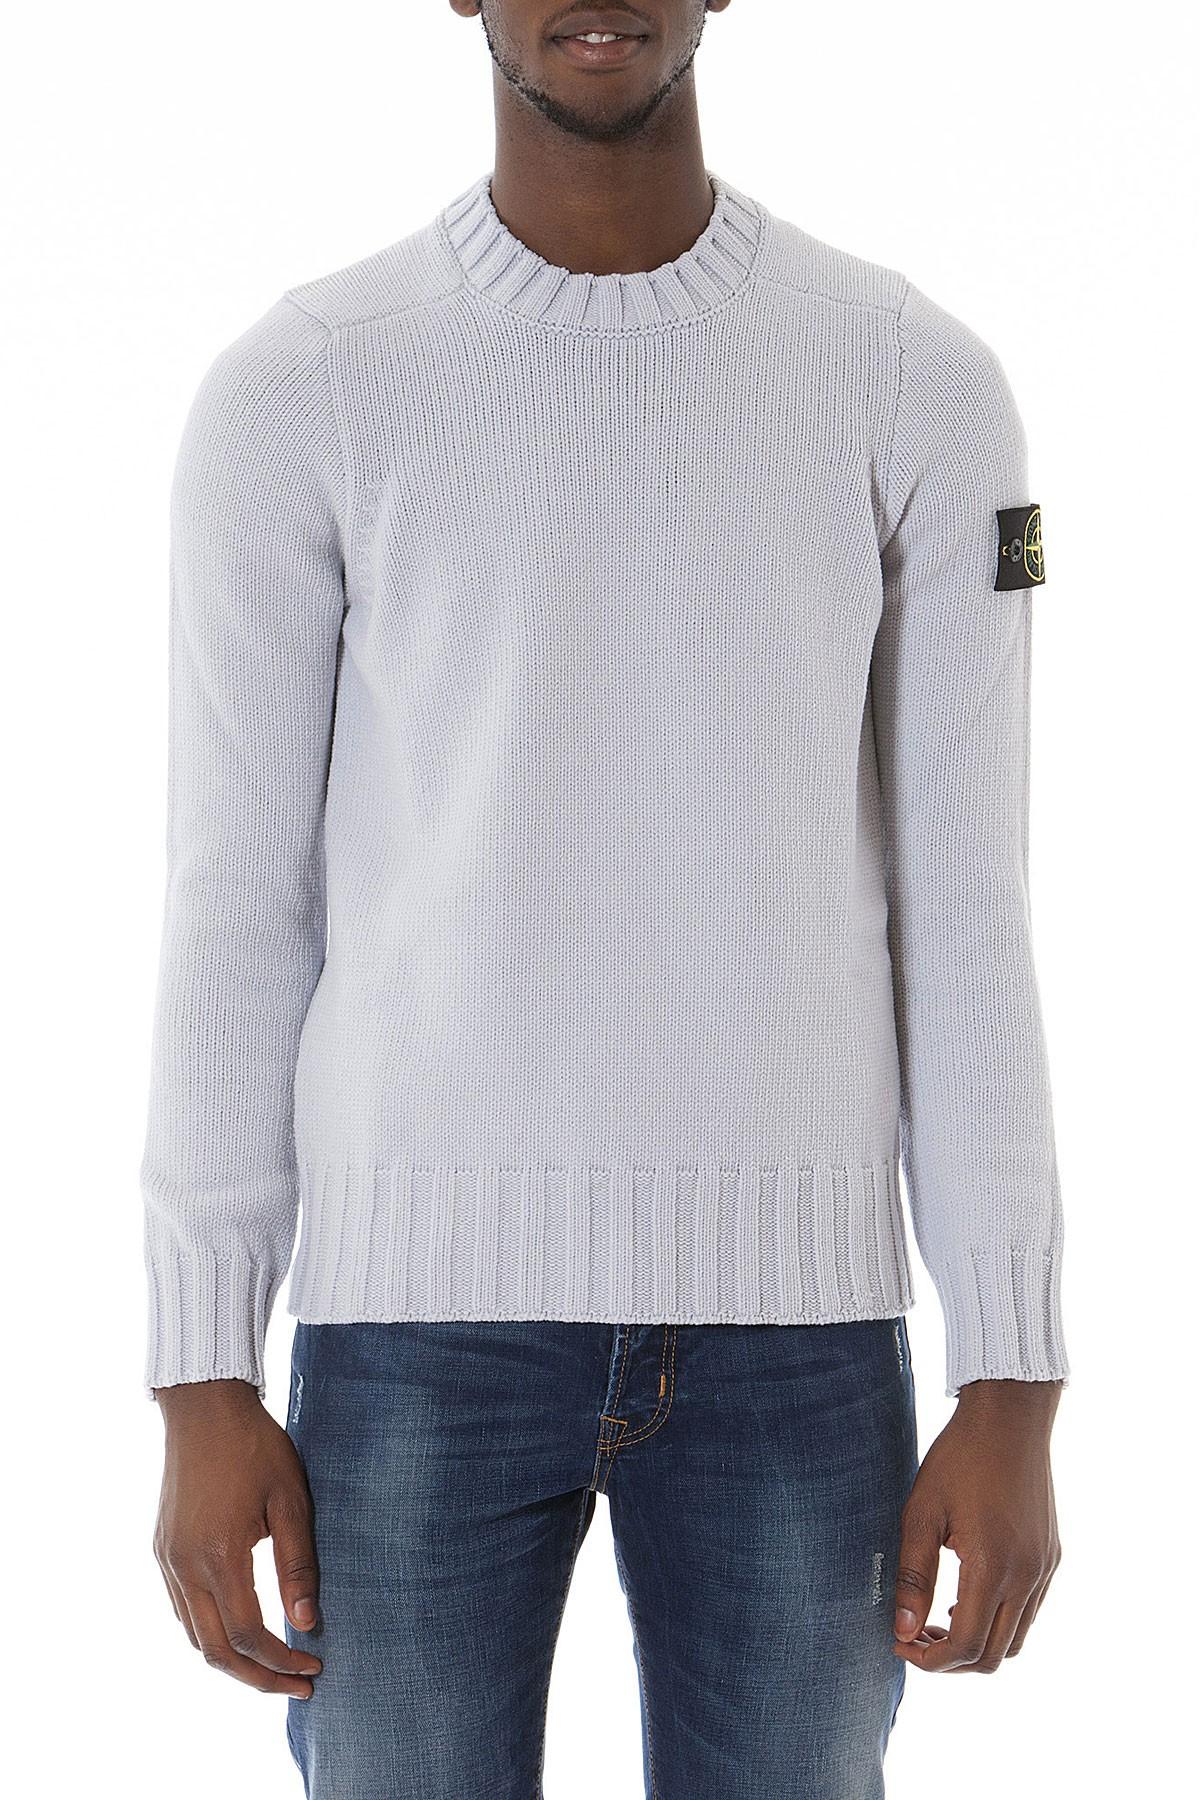 reputable site 5f7b4 bbfc1 STONE ISLAND Gray crew-neck sweater for men autumn winter 14-15